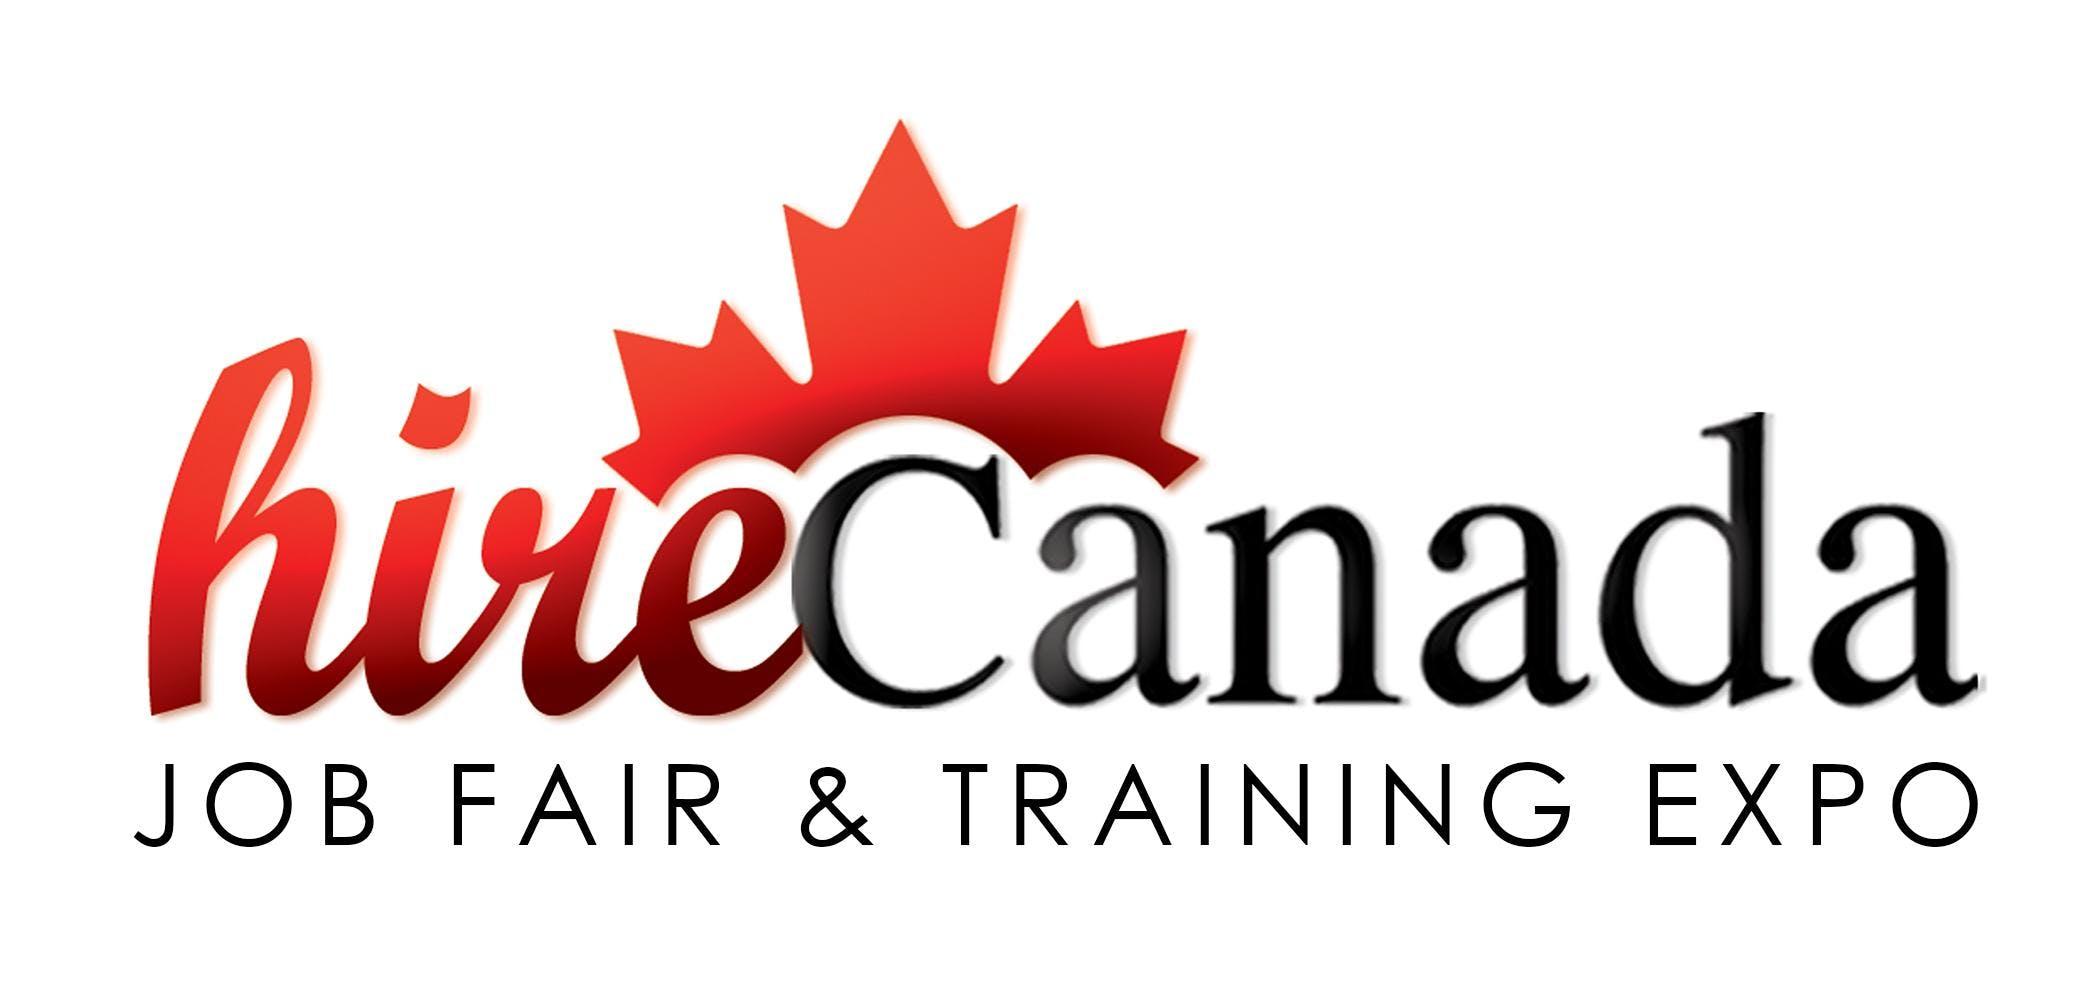 Hire Canada Job Fair & Training Expo